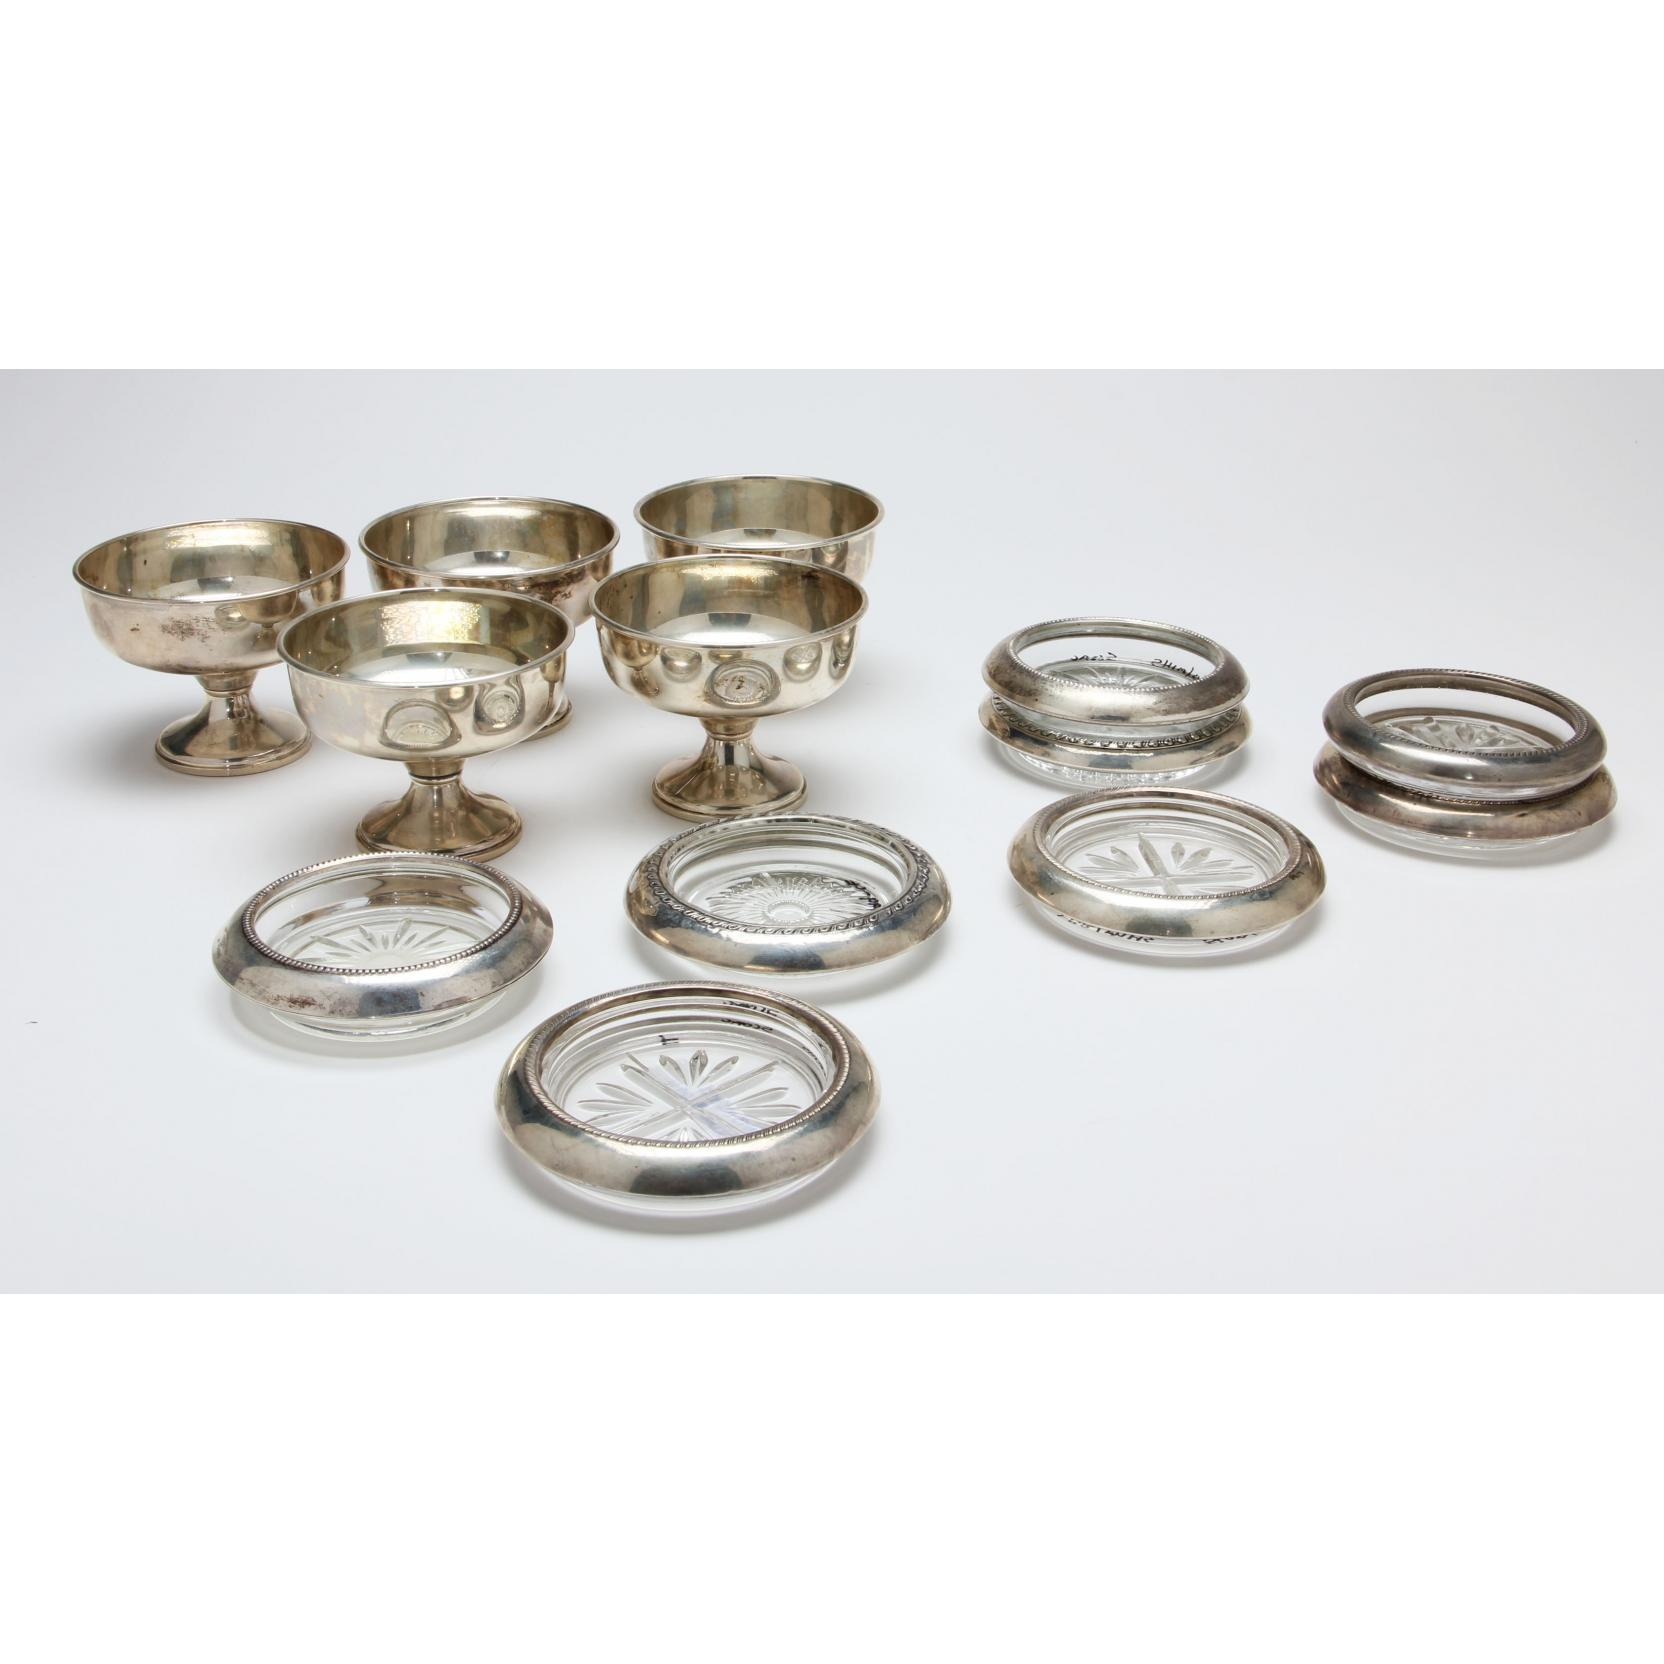 8-sterling-rimmed-coasters-5-sterling-silver-sherbets